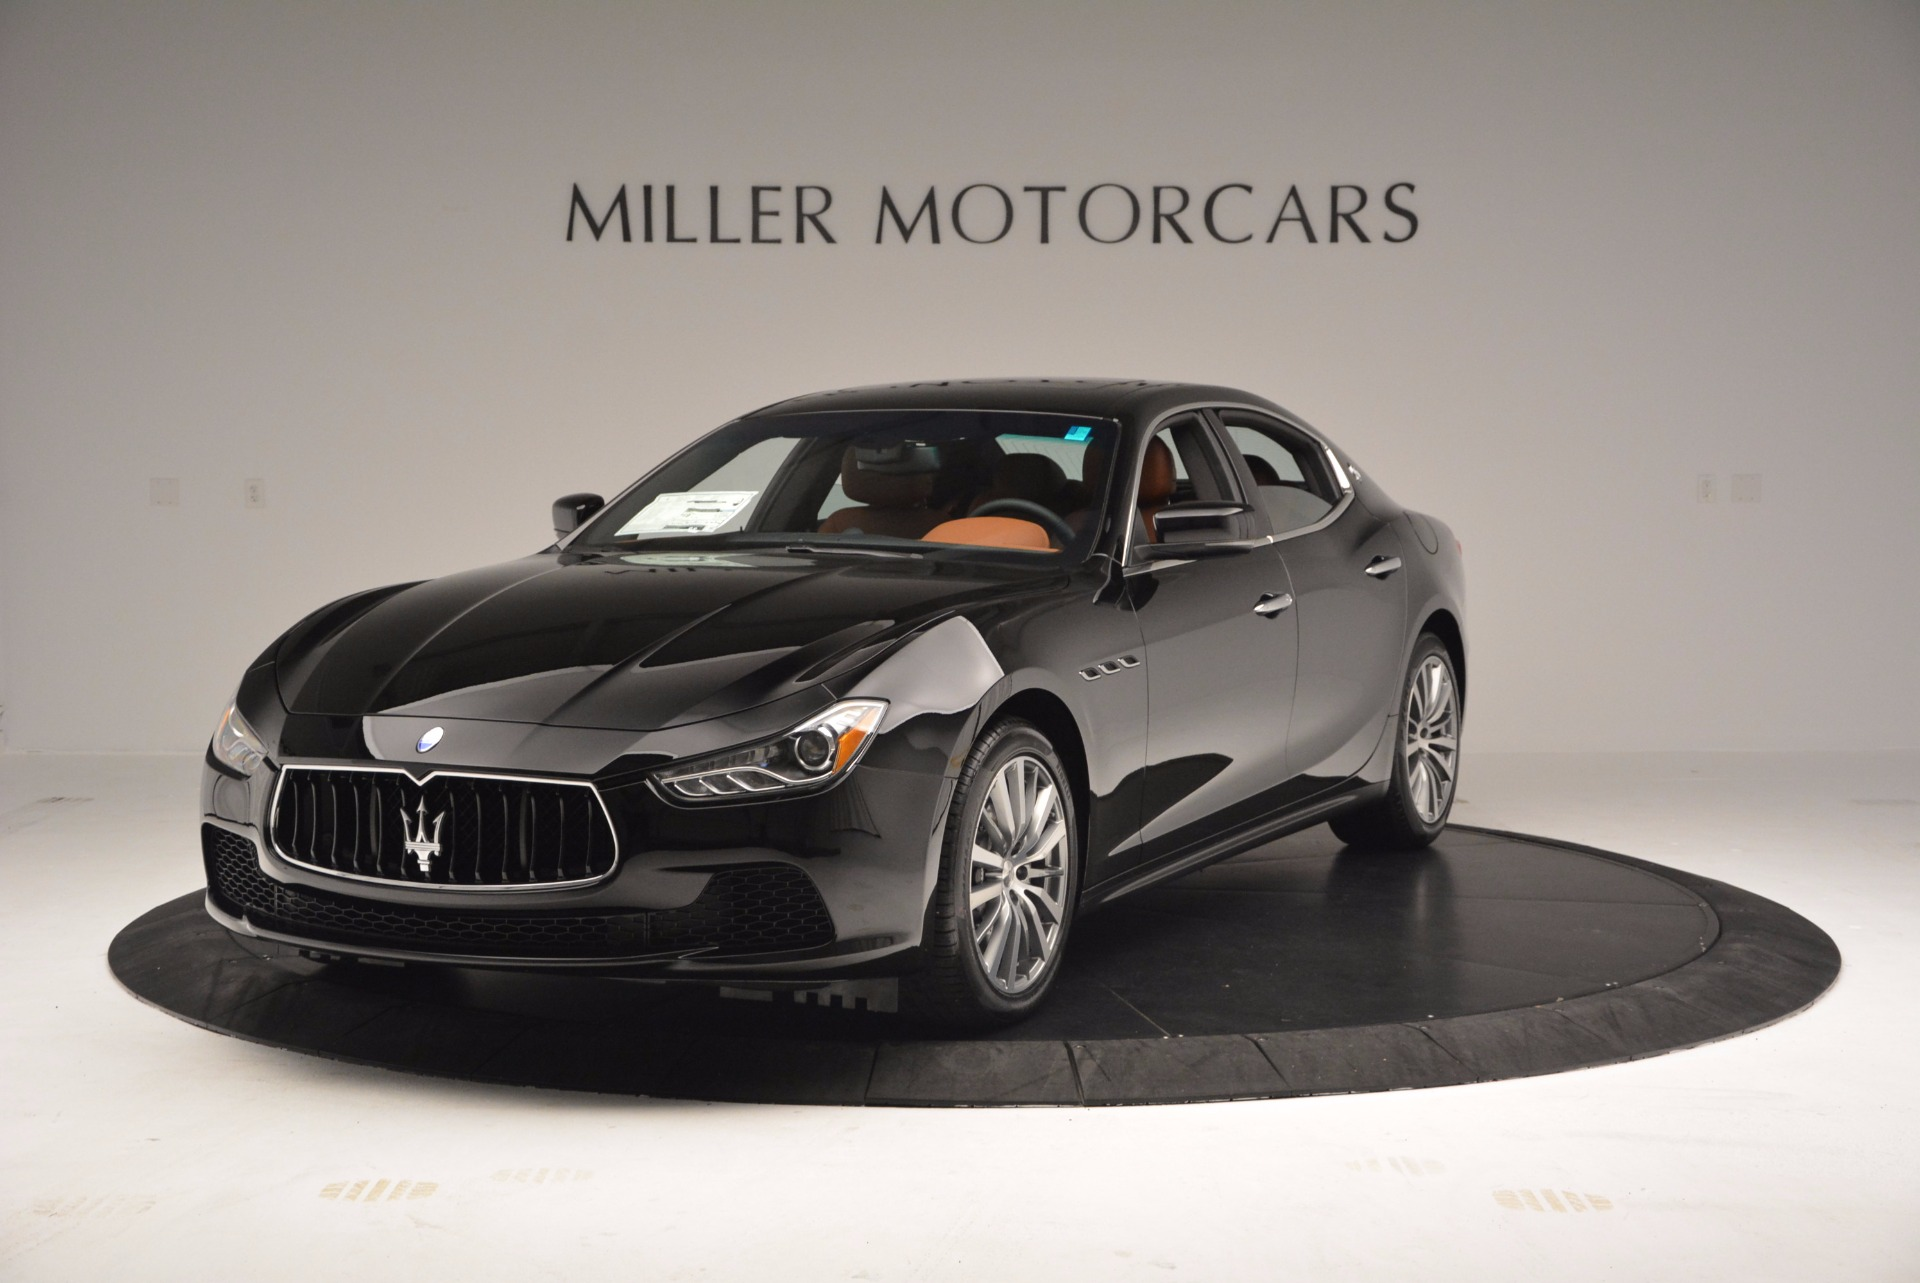 New 2017 Maserati Ghibli S Q4 EX-LOANER For Sale In Greenwich, CT 1115_main